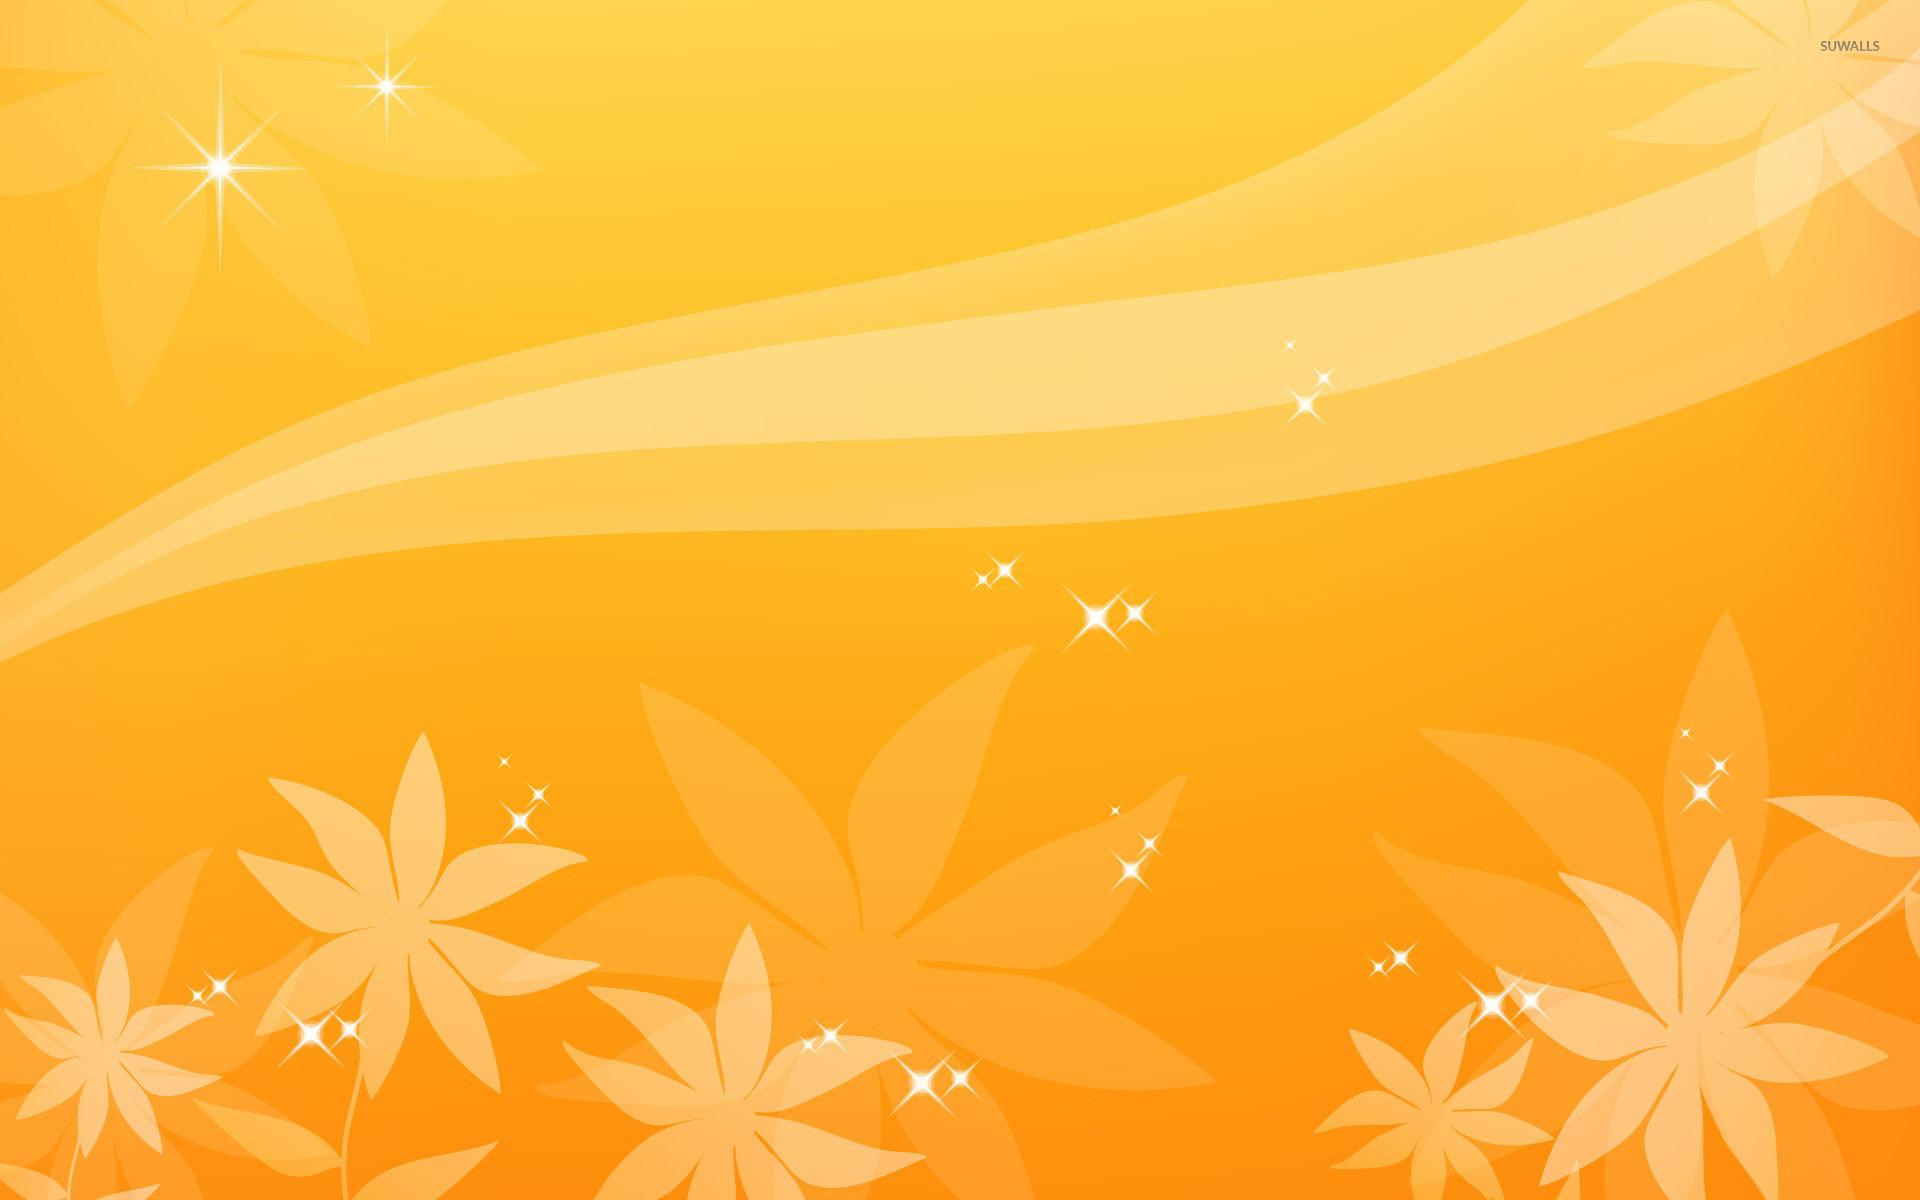 yellow sparkling flowers wallpaper digital art